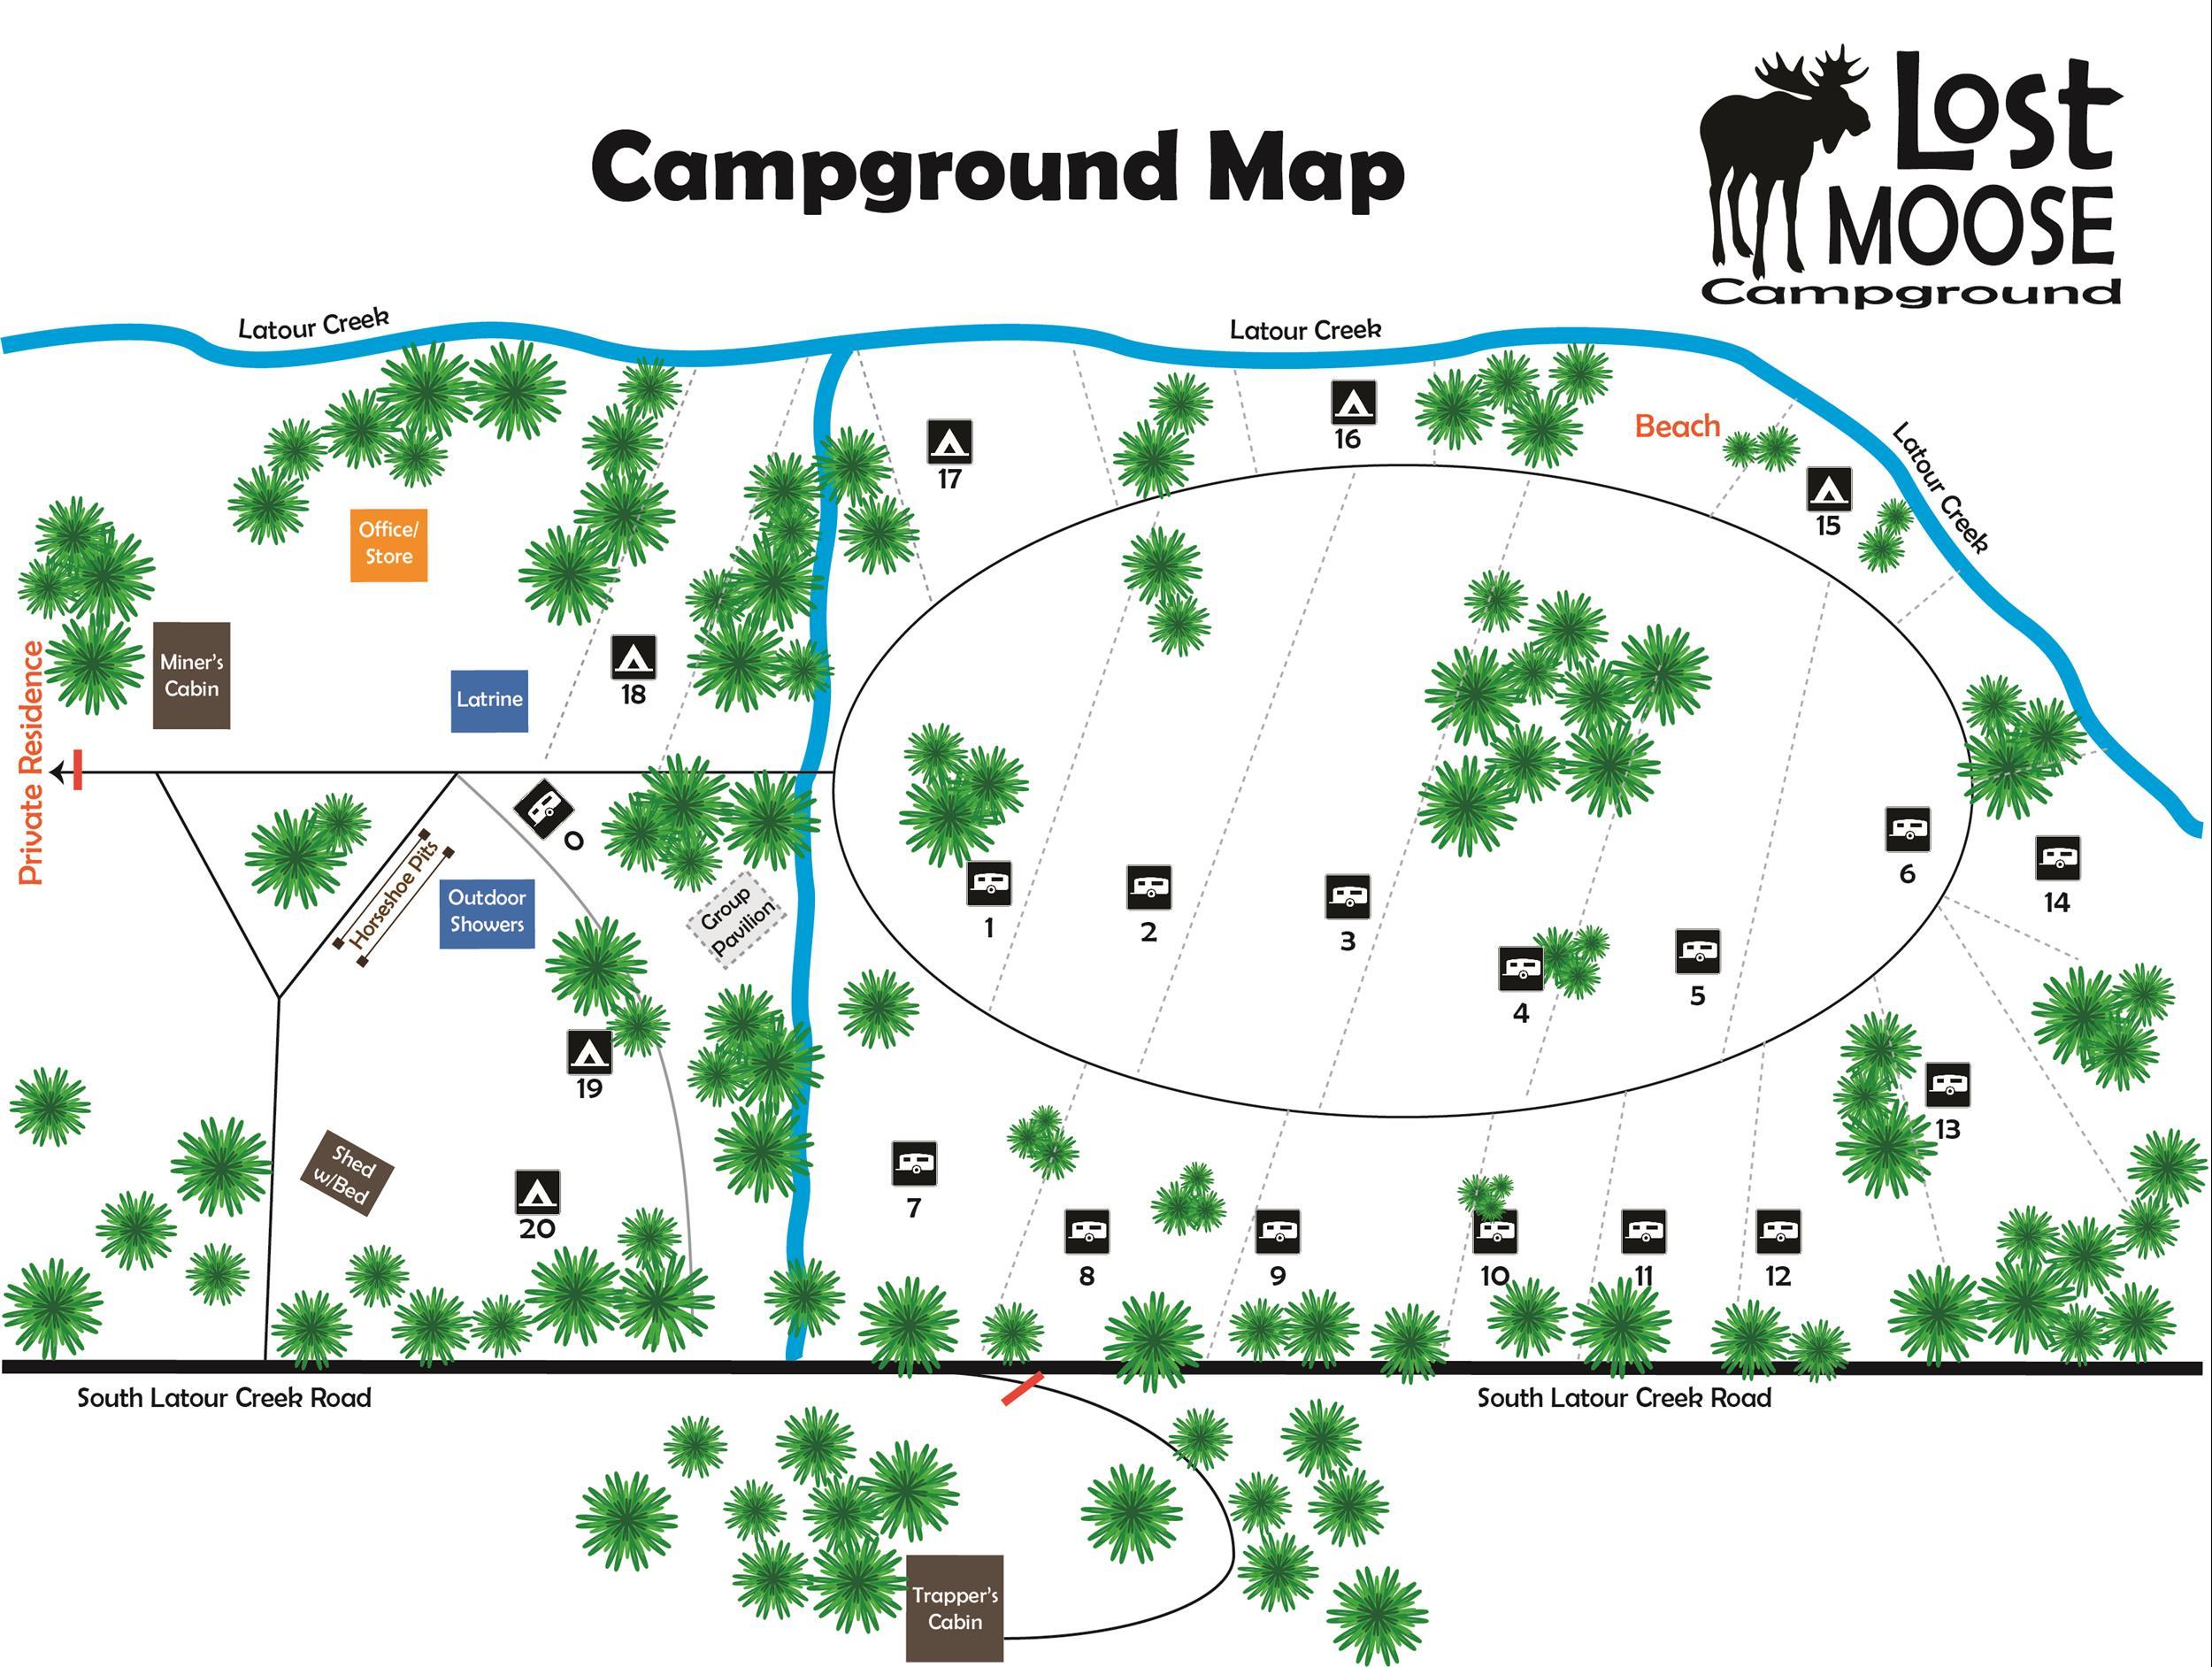 Lost Moose Campground in Cataldo, Idaho - Home